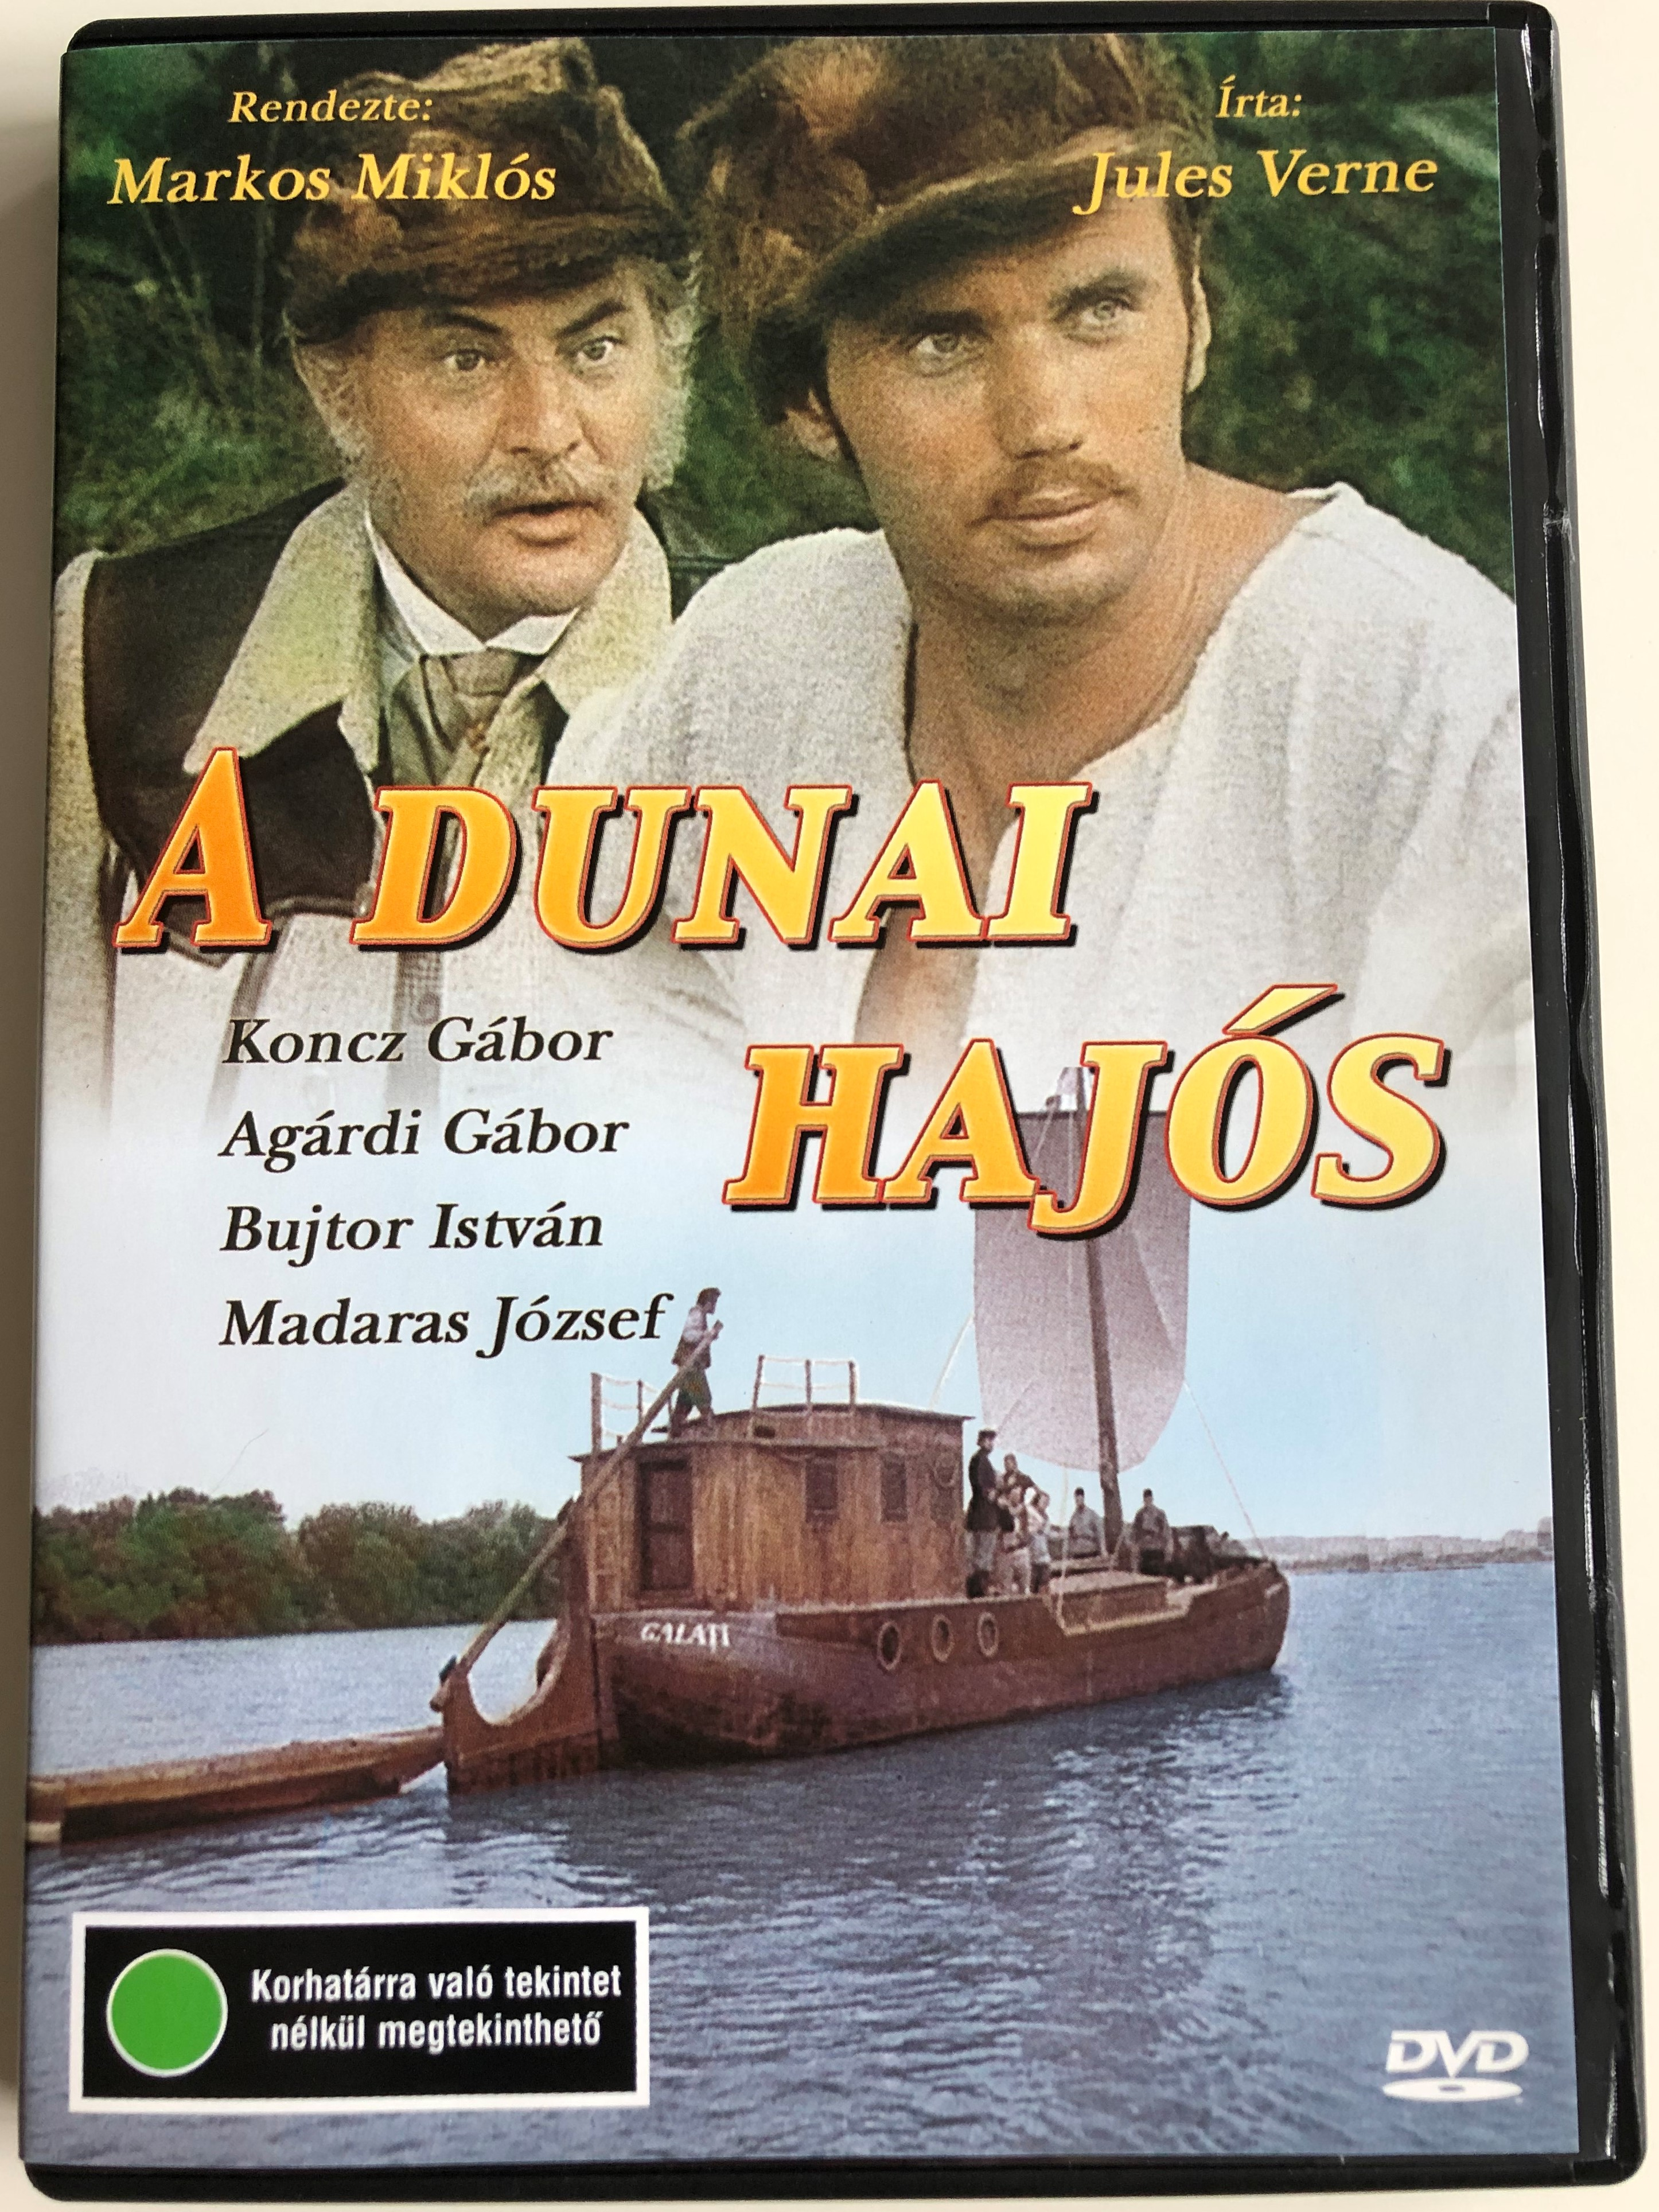 a-dunai-haj-s-dvd-1977-directed-by-markos-mikl-s-written-by-jules-verne-starring-koncz-g-bor-ag-rdi-g-bor-bujtor-istv-n-madaras-j-zsef-k-llai-ferenc-latinovits-zolt-n-mensz-tor-magdolna-1-.jpg